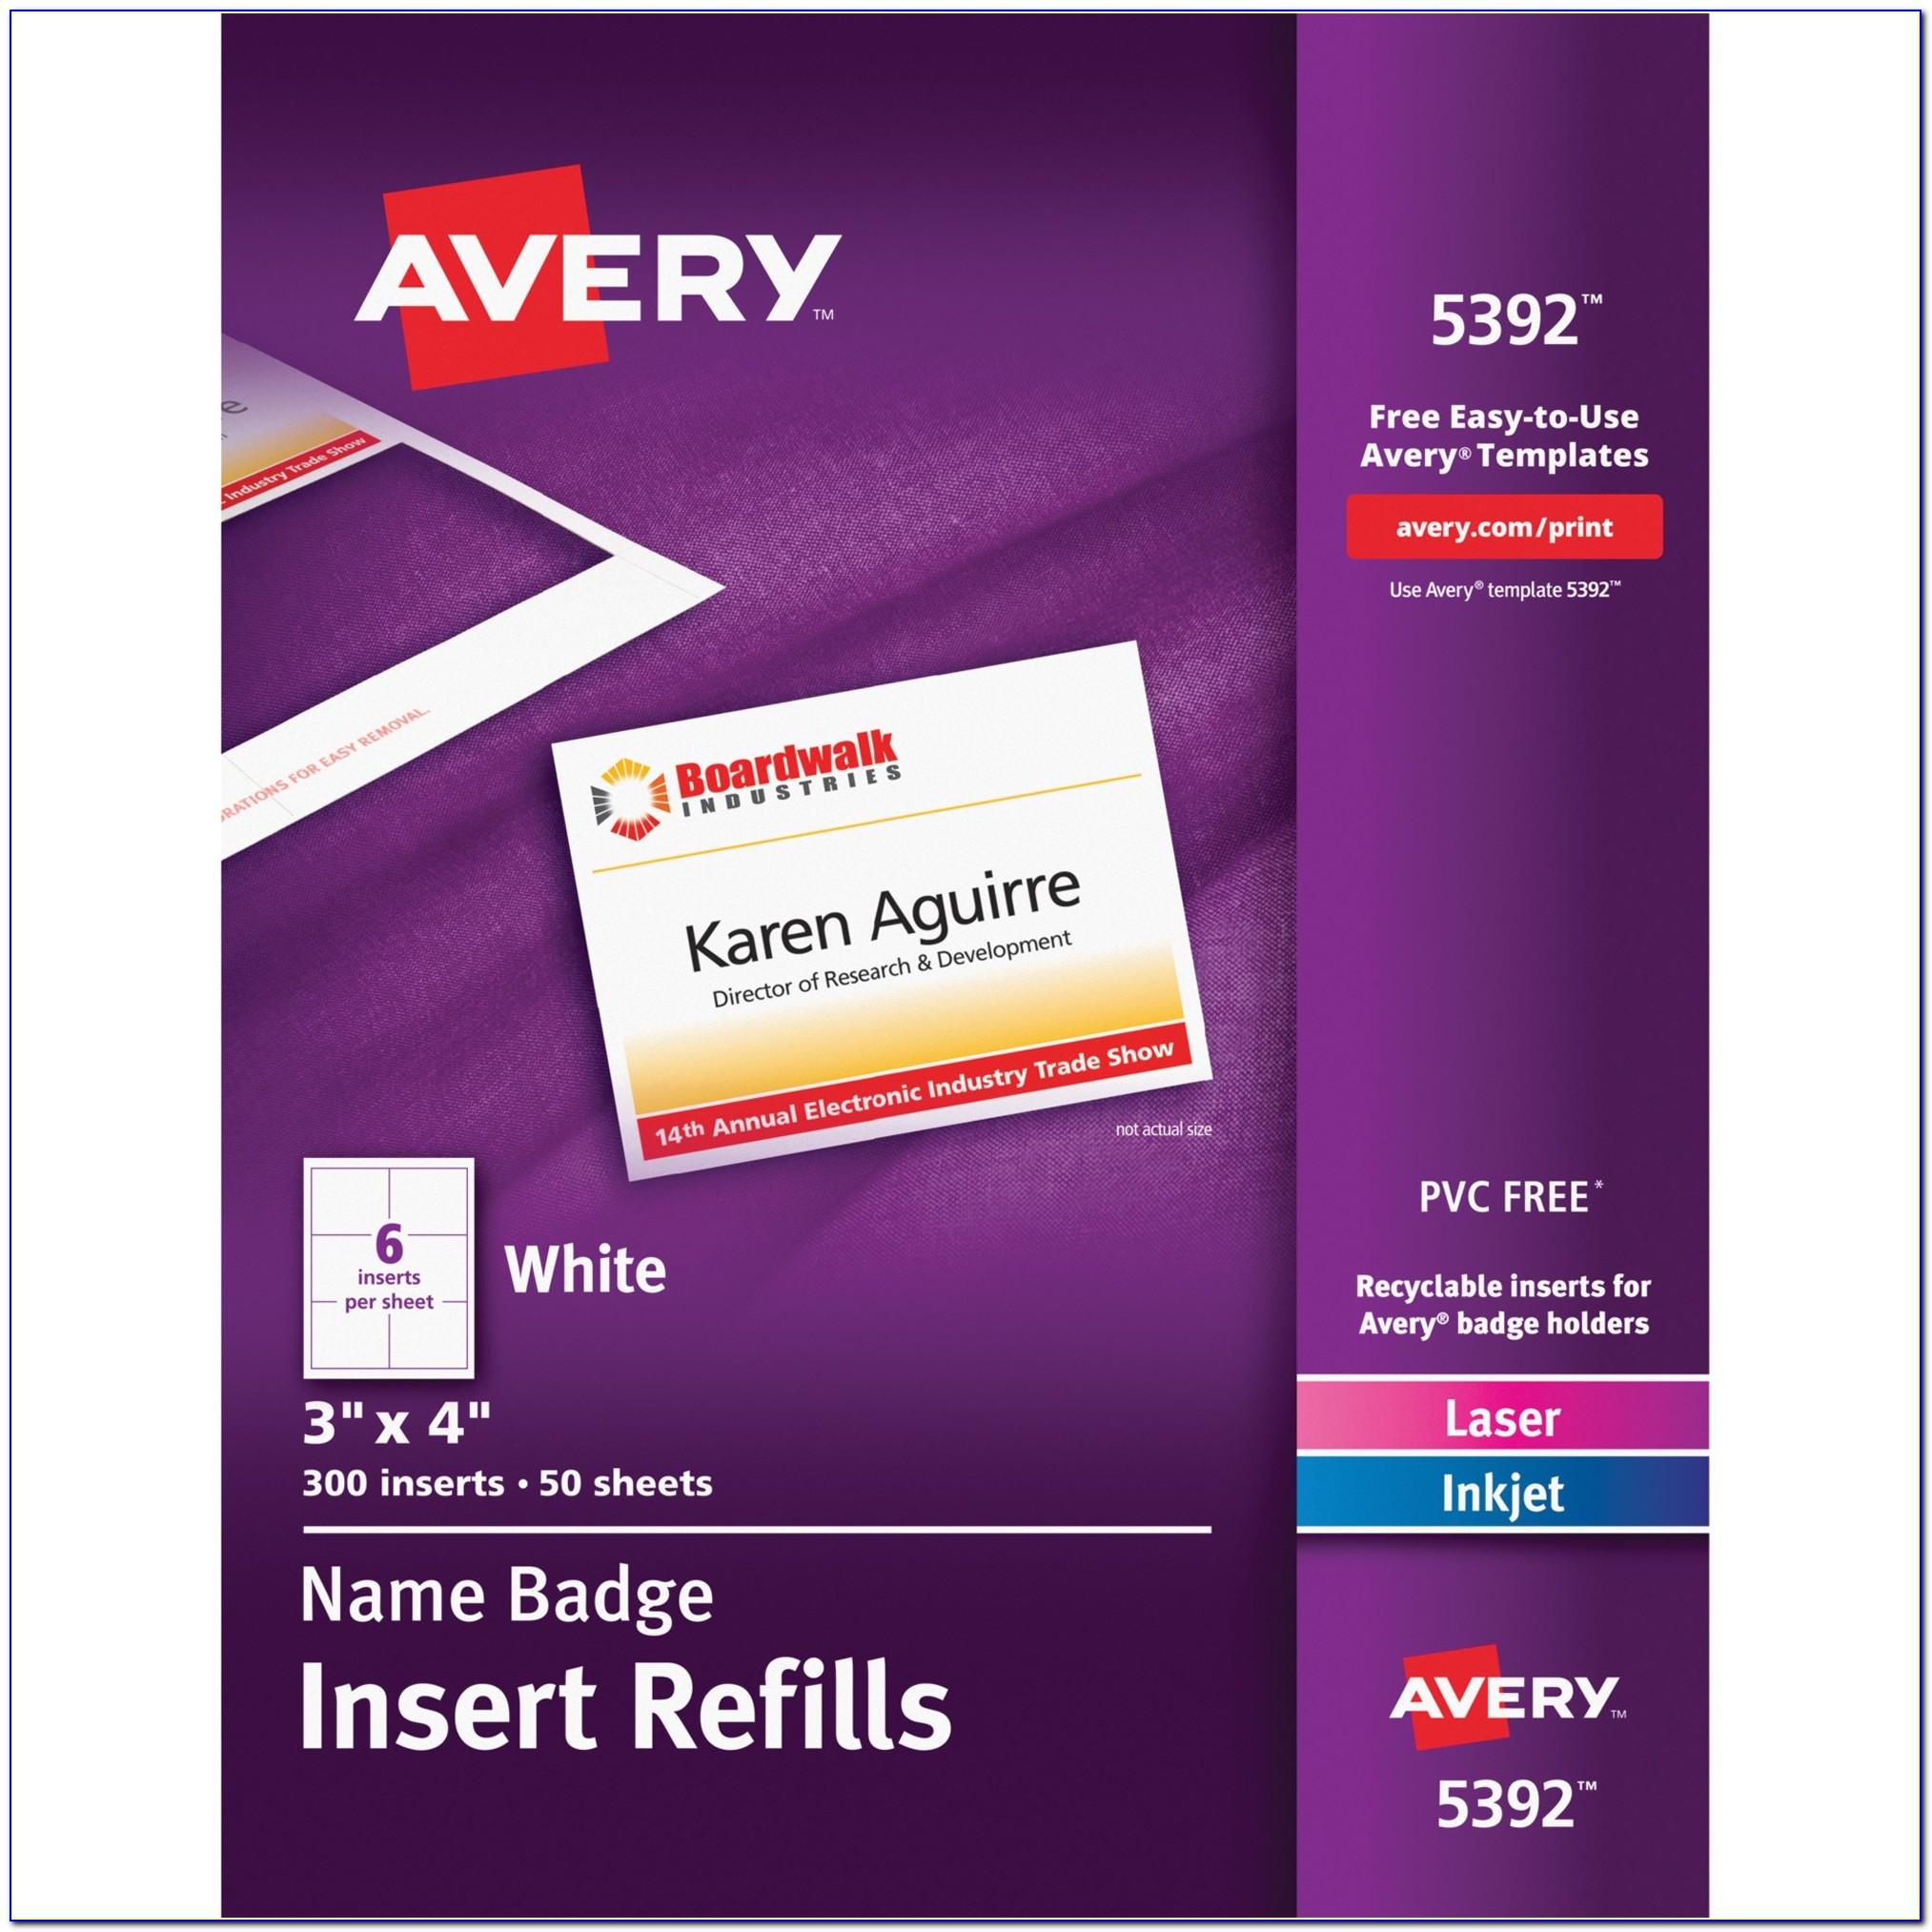 Avery Vertical Name Badge Template Avery Name Badge Insert Refill Ave5392 Supplygeeks Com